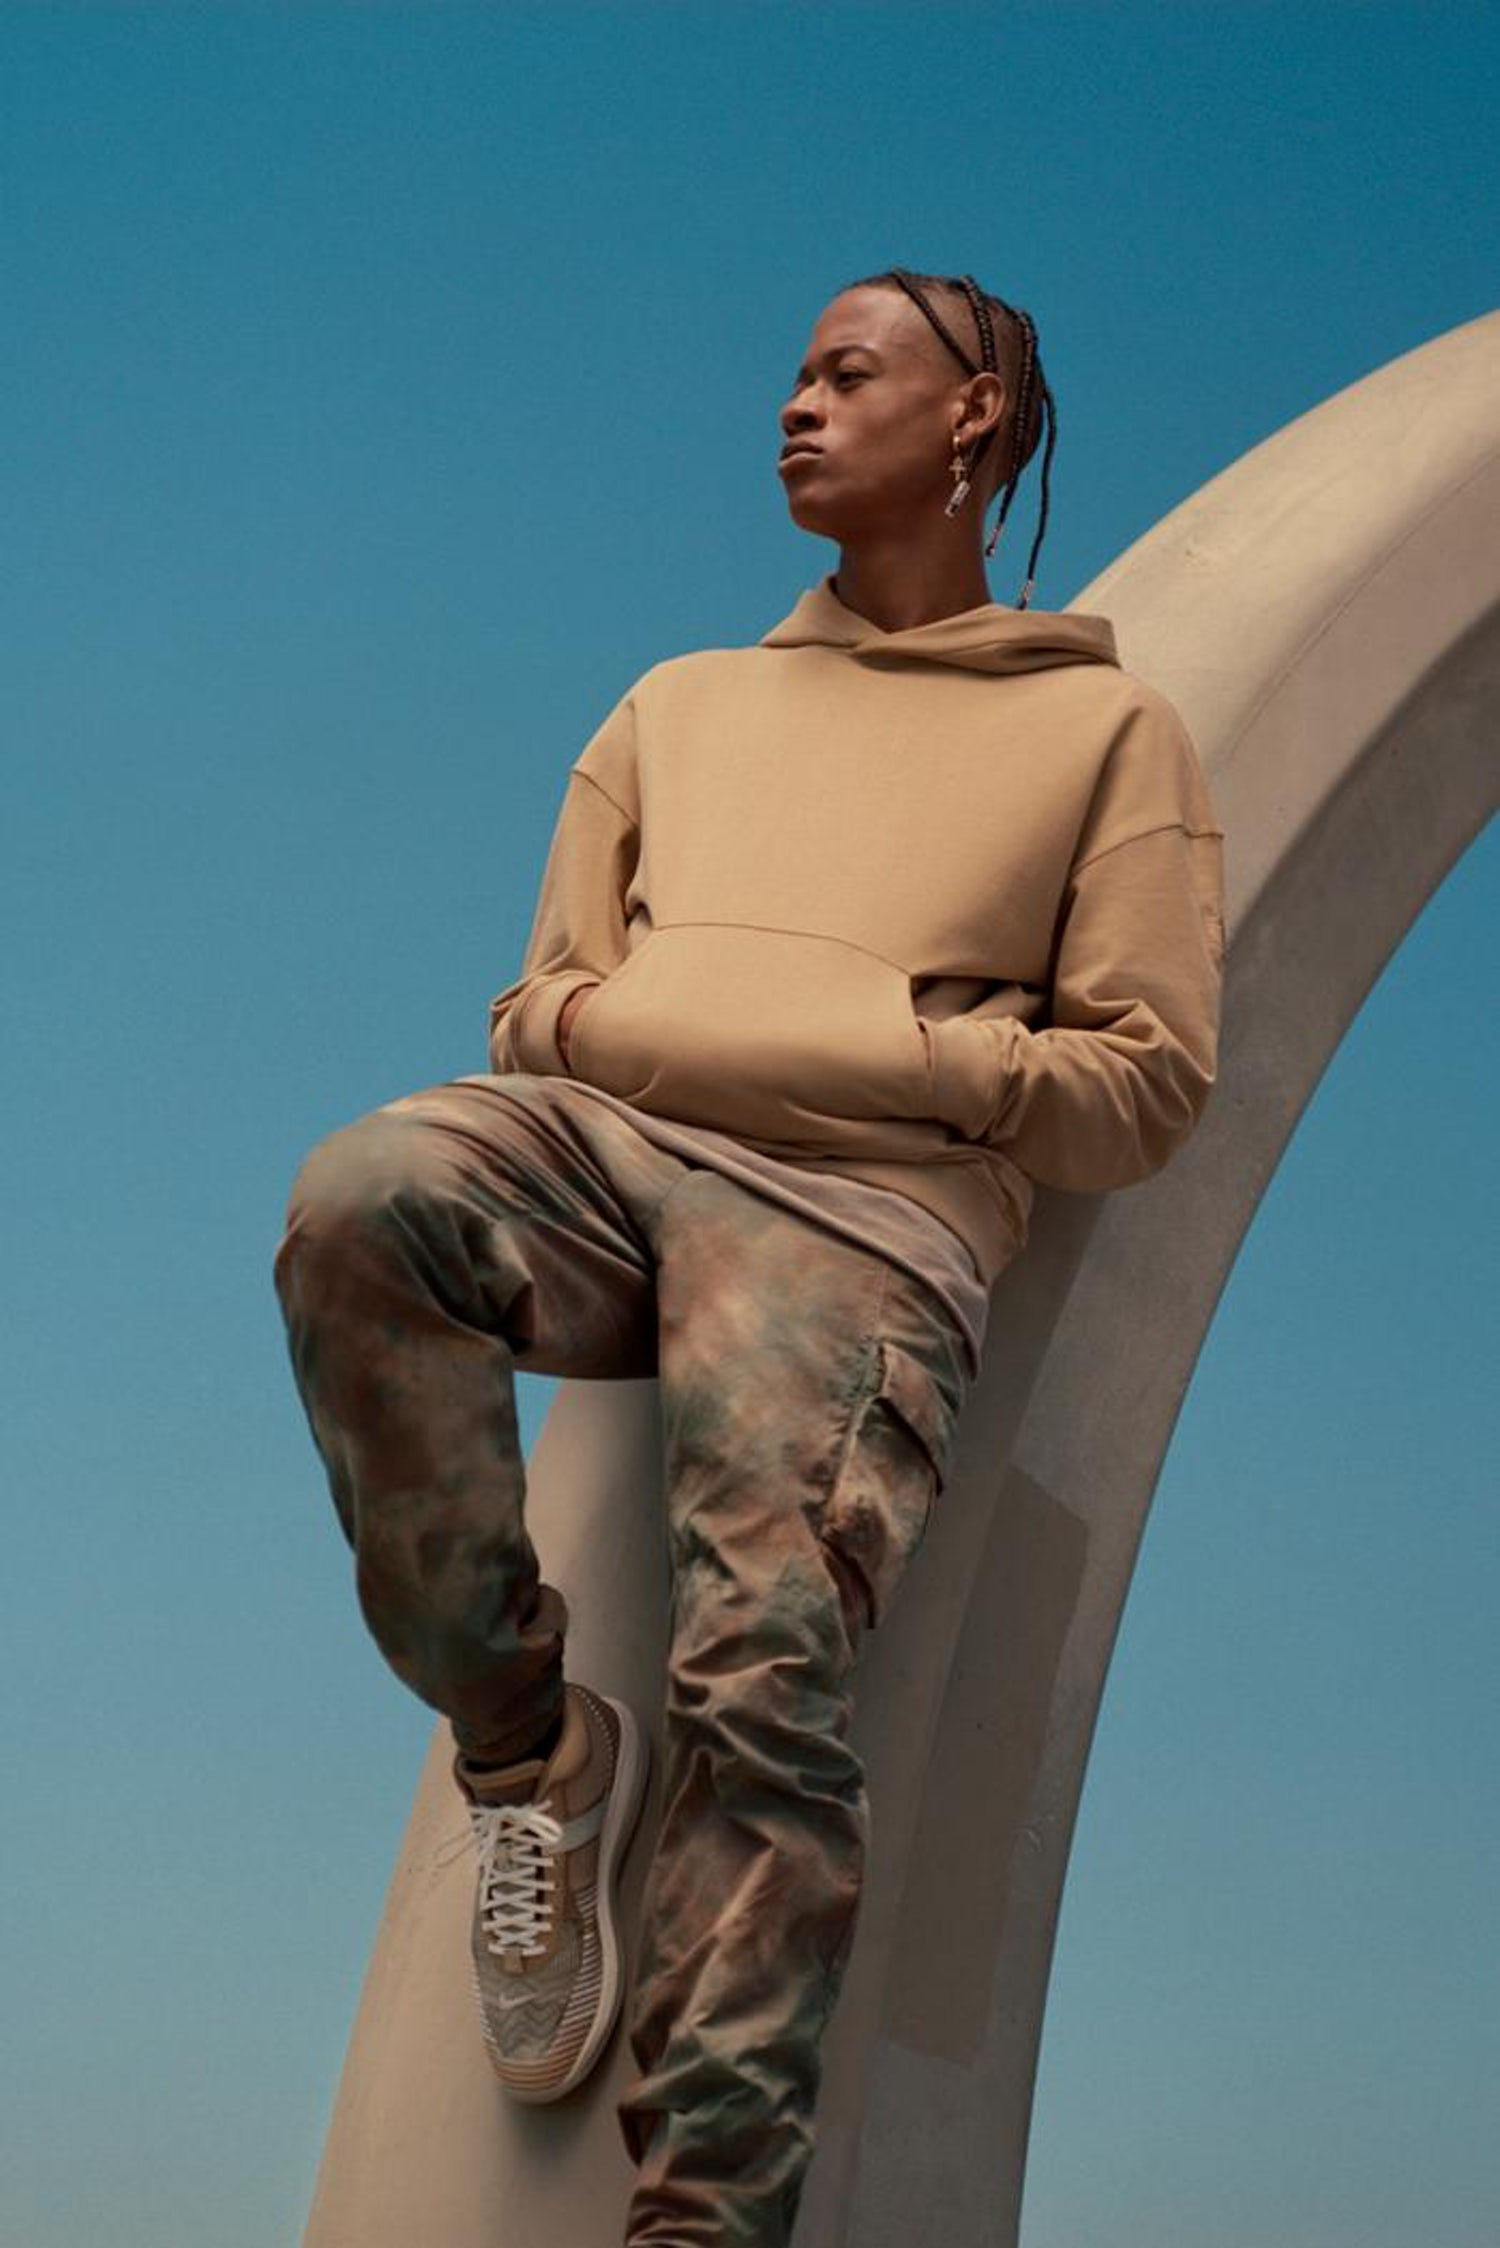 https   hypebeast.com image 2019 10 john elliott nike lebron icon qs apparel clothing collab 1